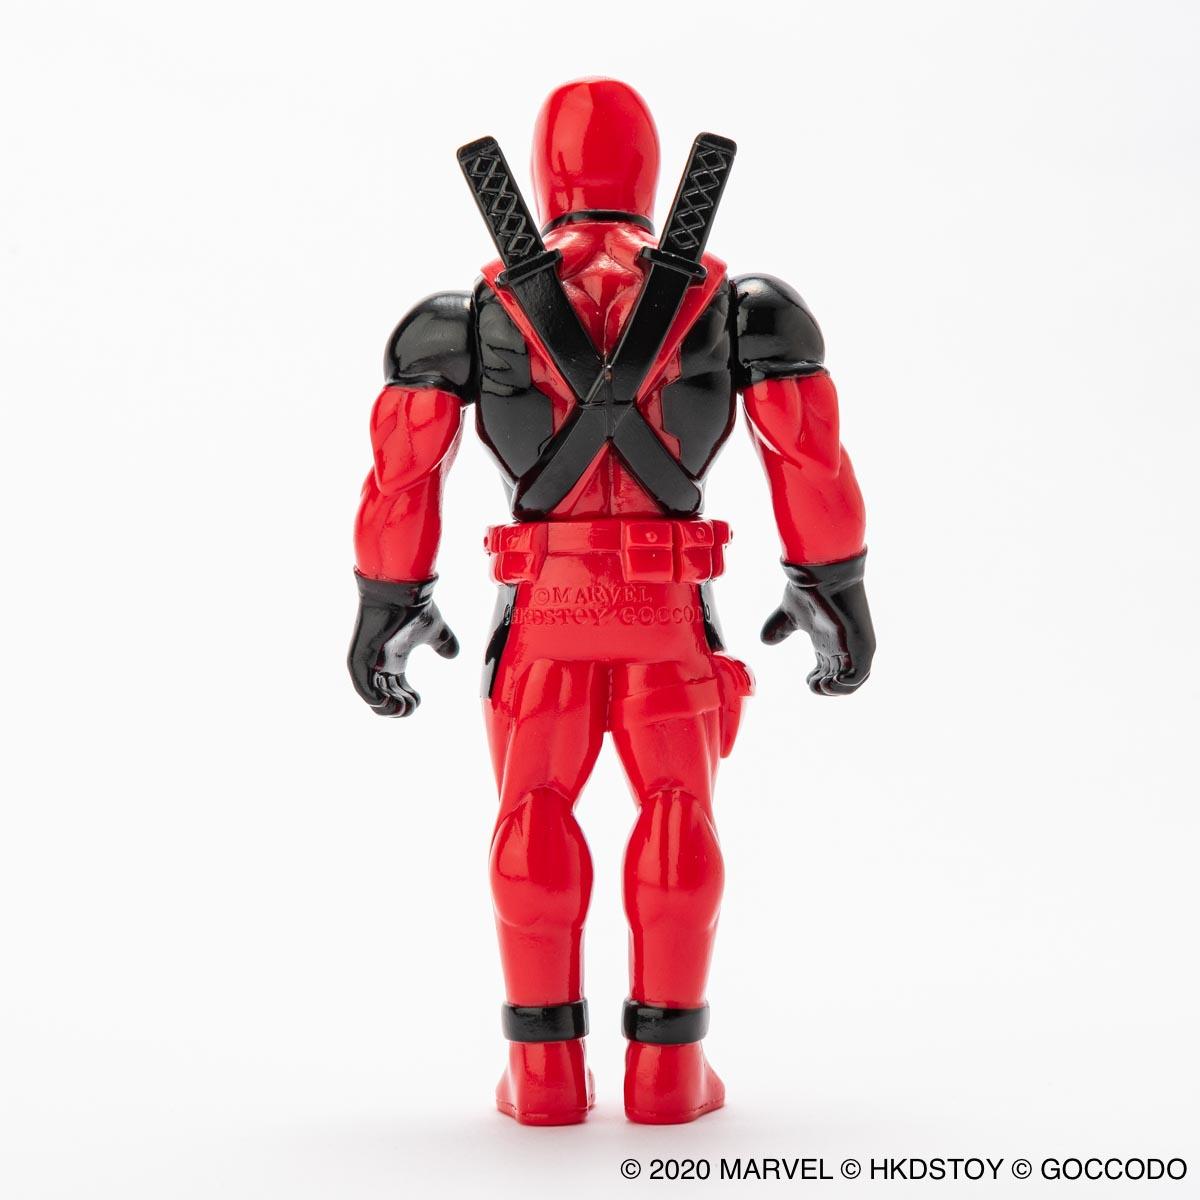 HKDSTOY × GOCCODO -MARVEL [DEADPOOL] RED/BLACK